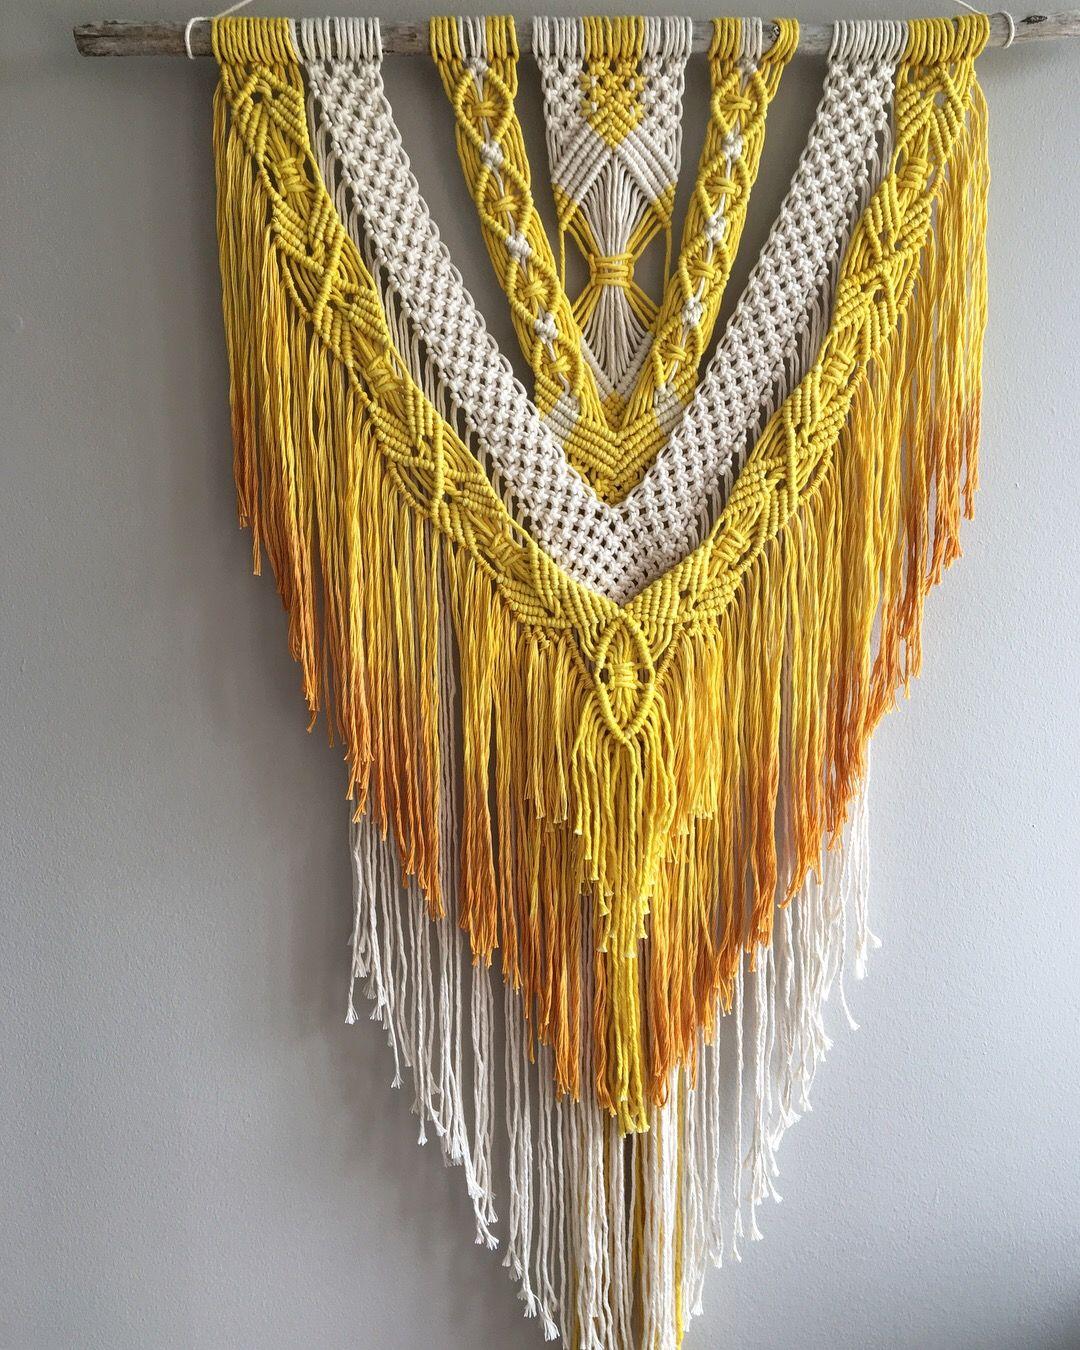 Macrame Wall Hanging, Natural Dye | Macrame Wall Hangings ...